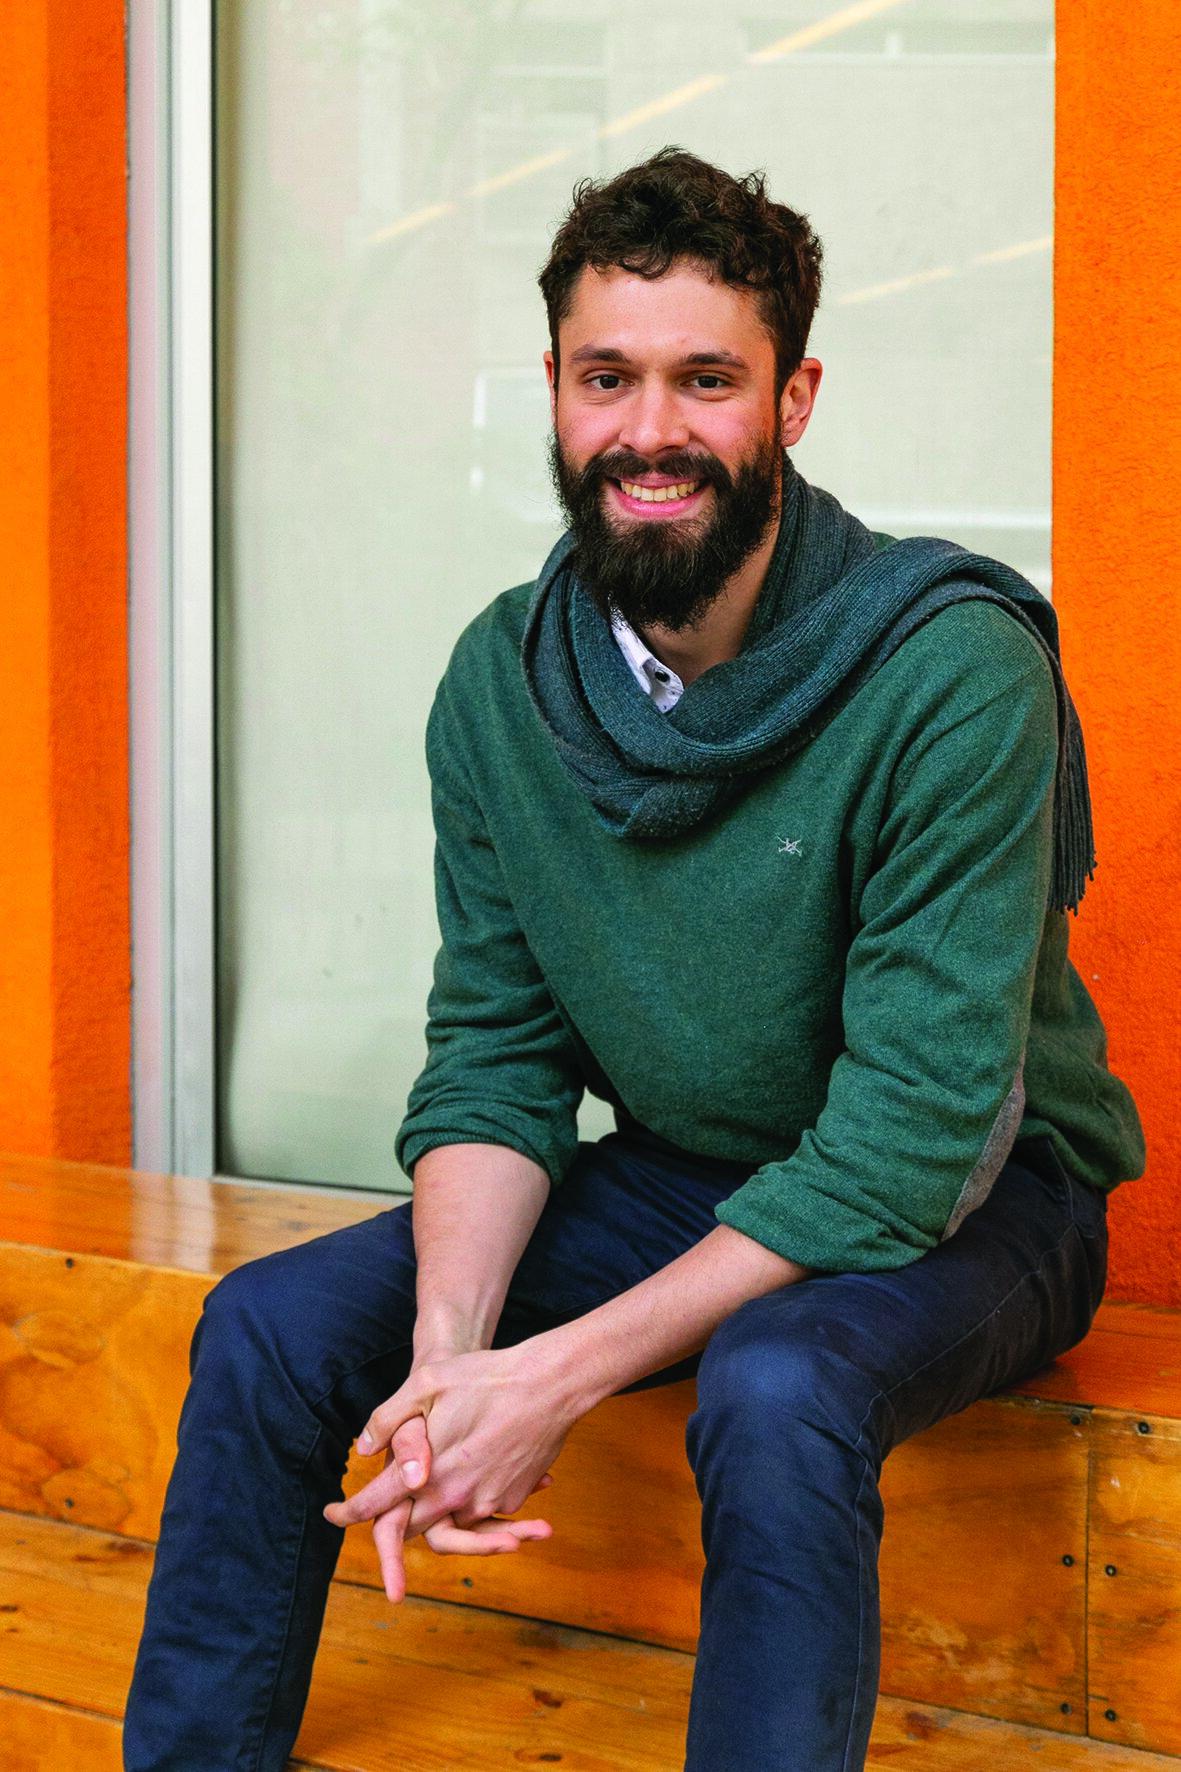 Tomás Aramburú